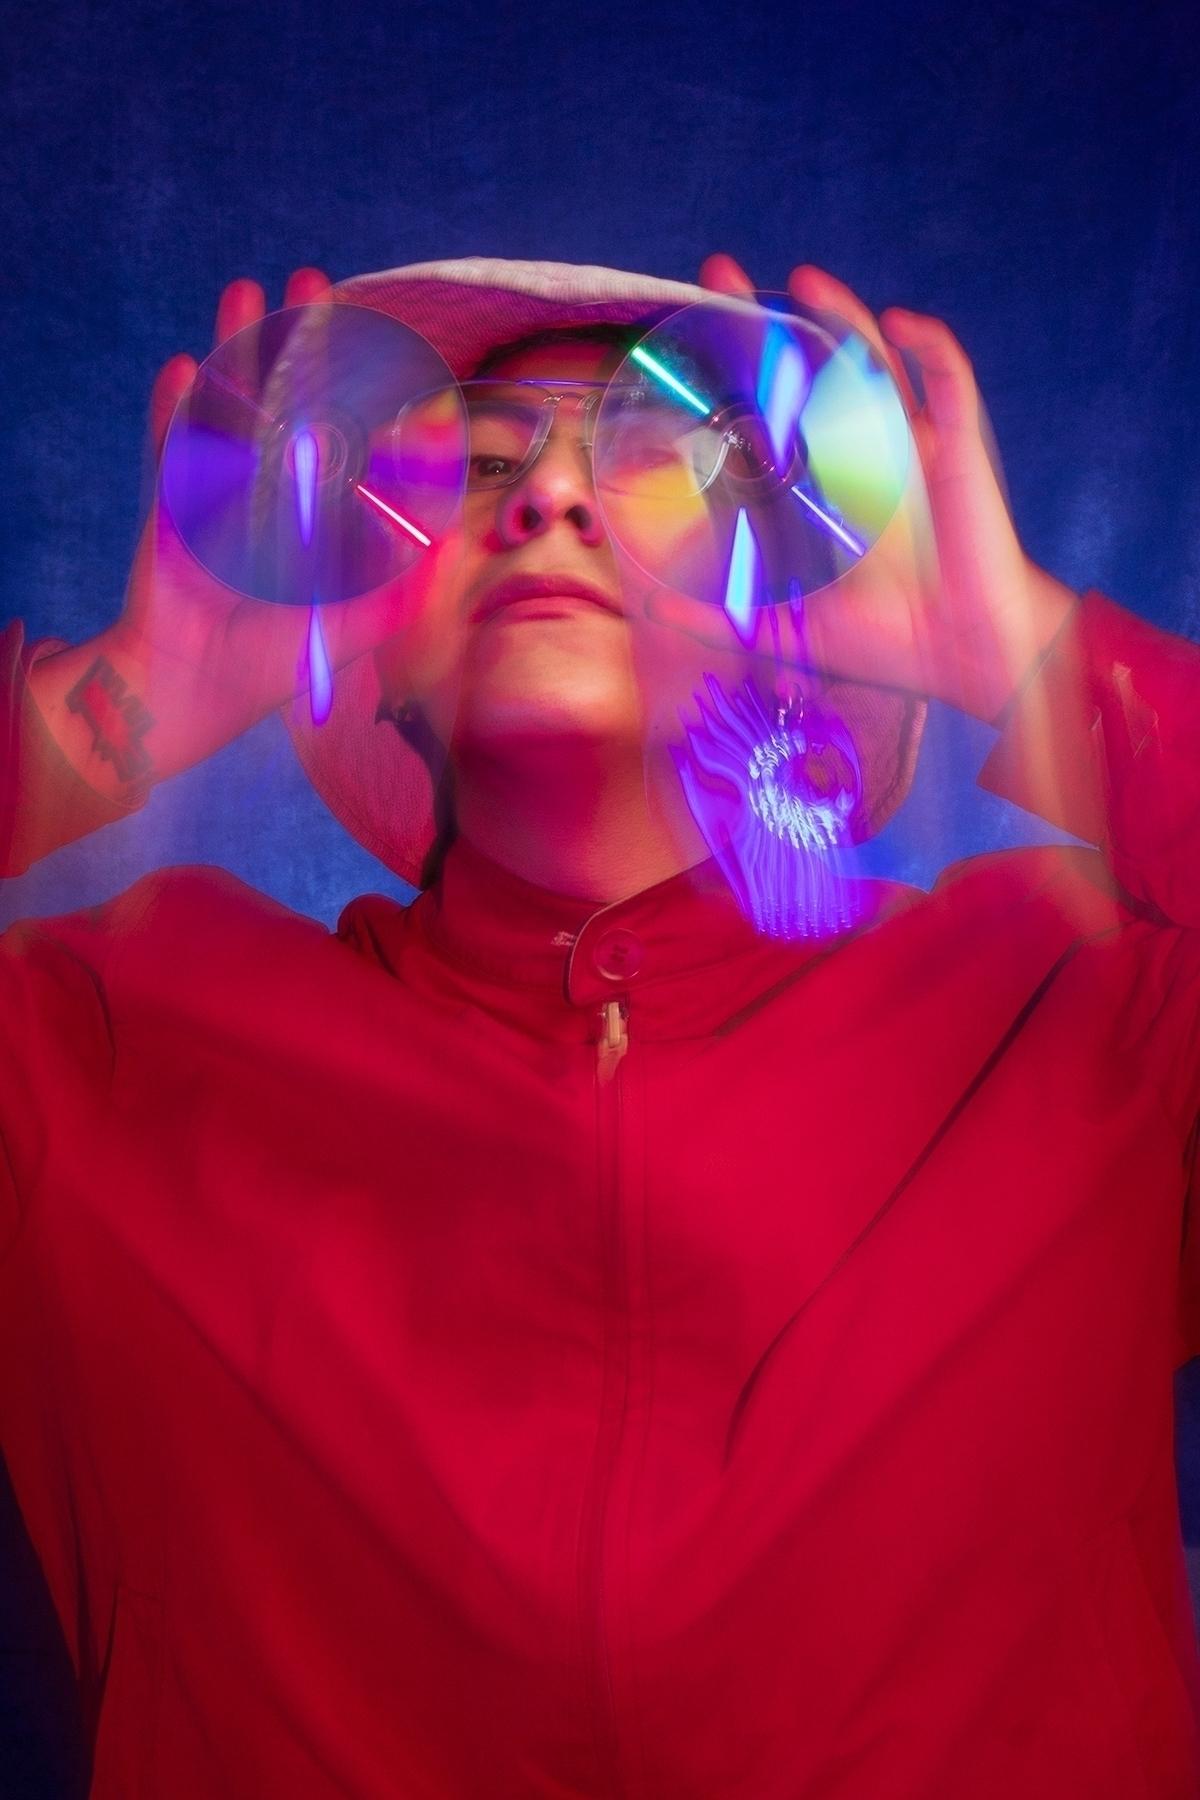 Selfportrait Discman - portrait - mrtronch | ello